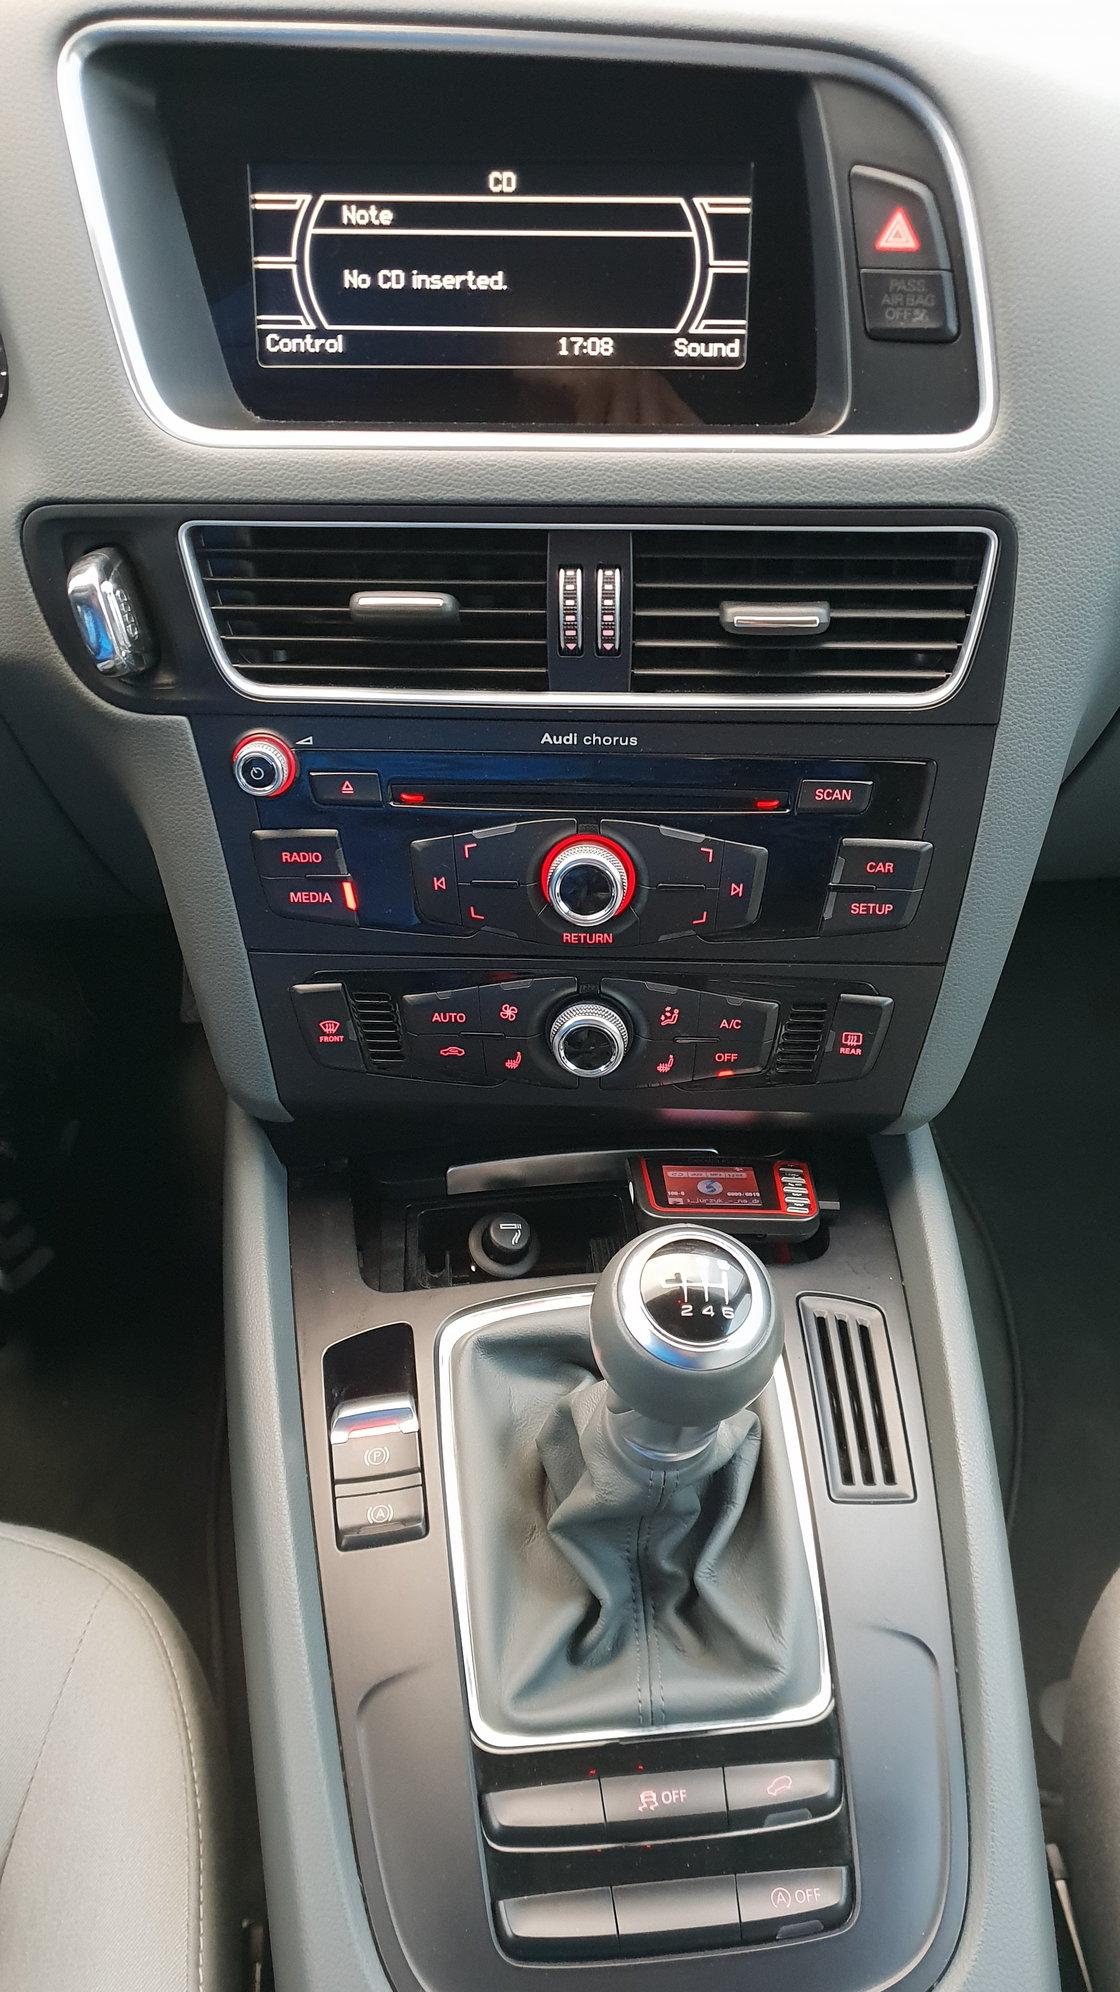 Chorus Radio Audi Q5 Aux And Navigation Android Audiworld Forums